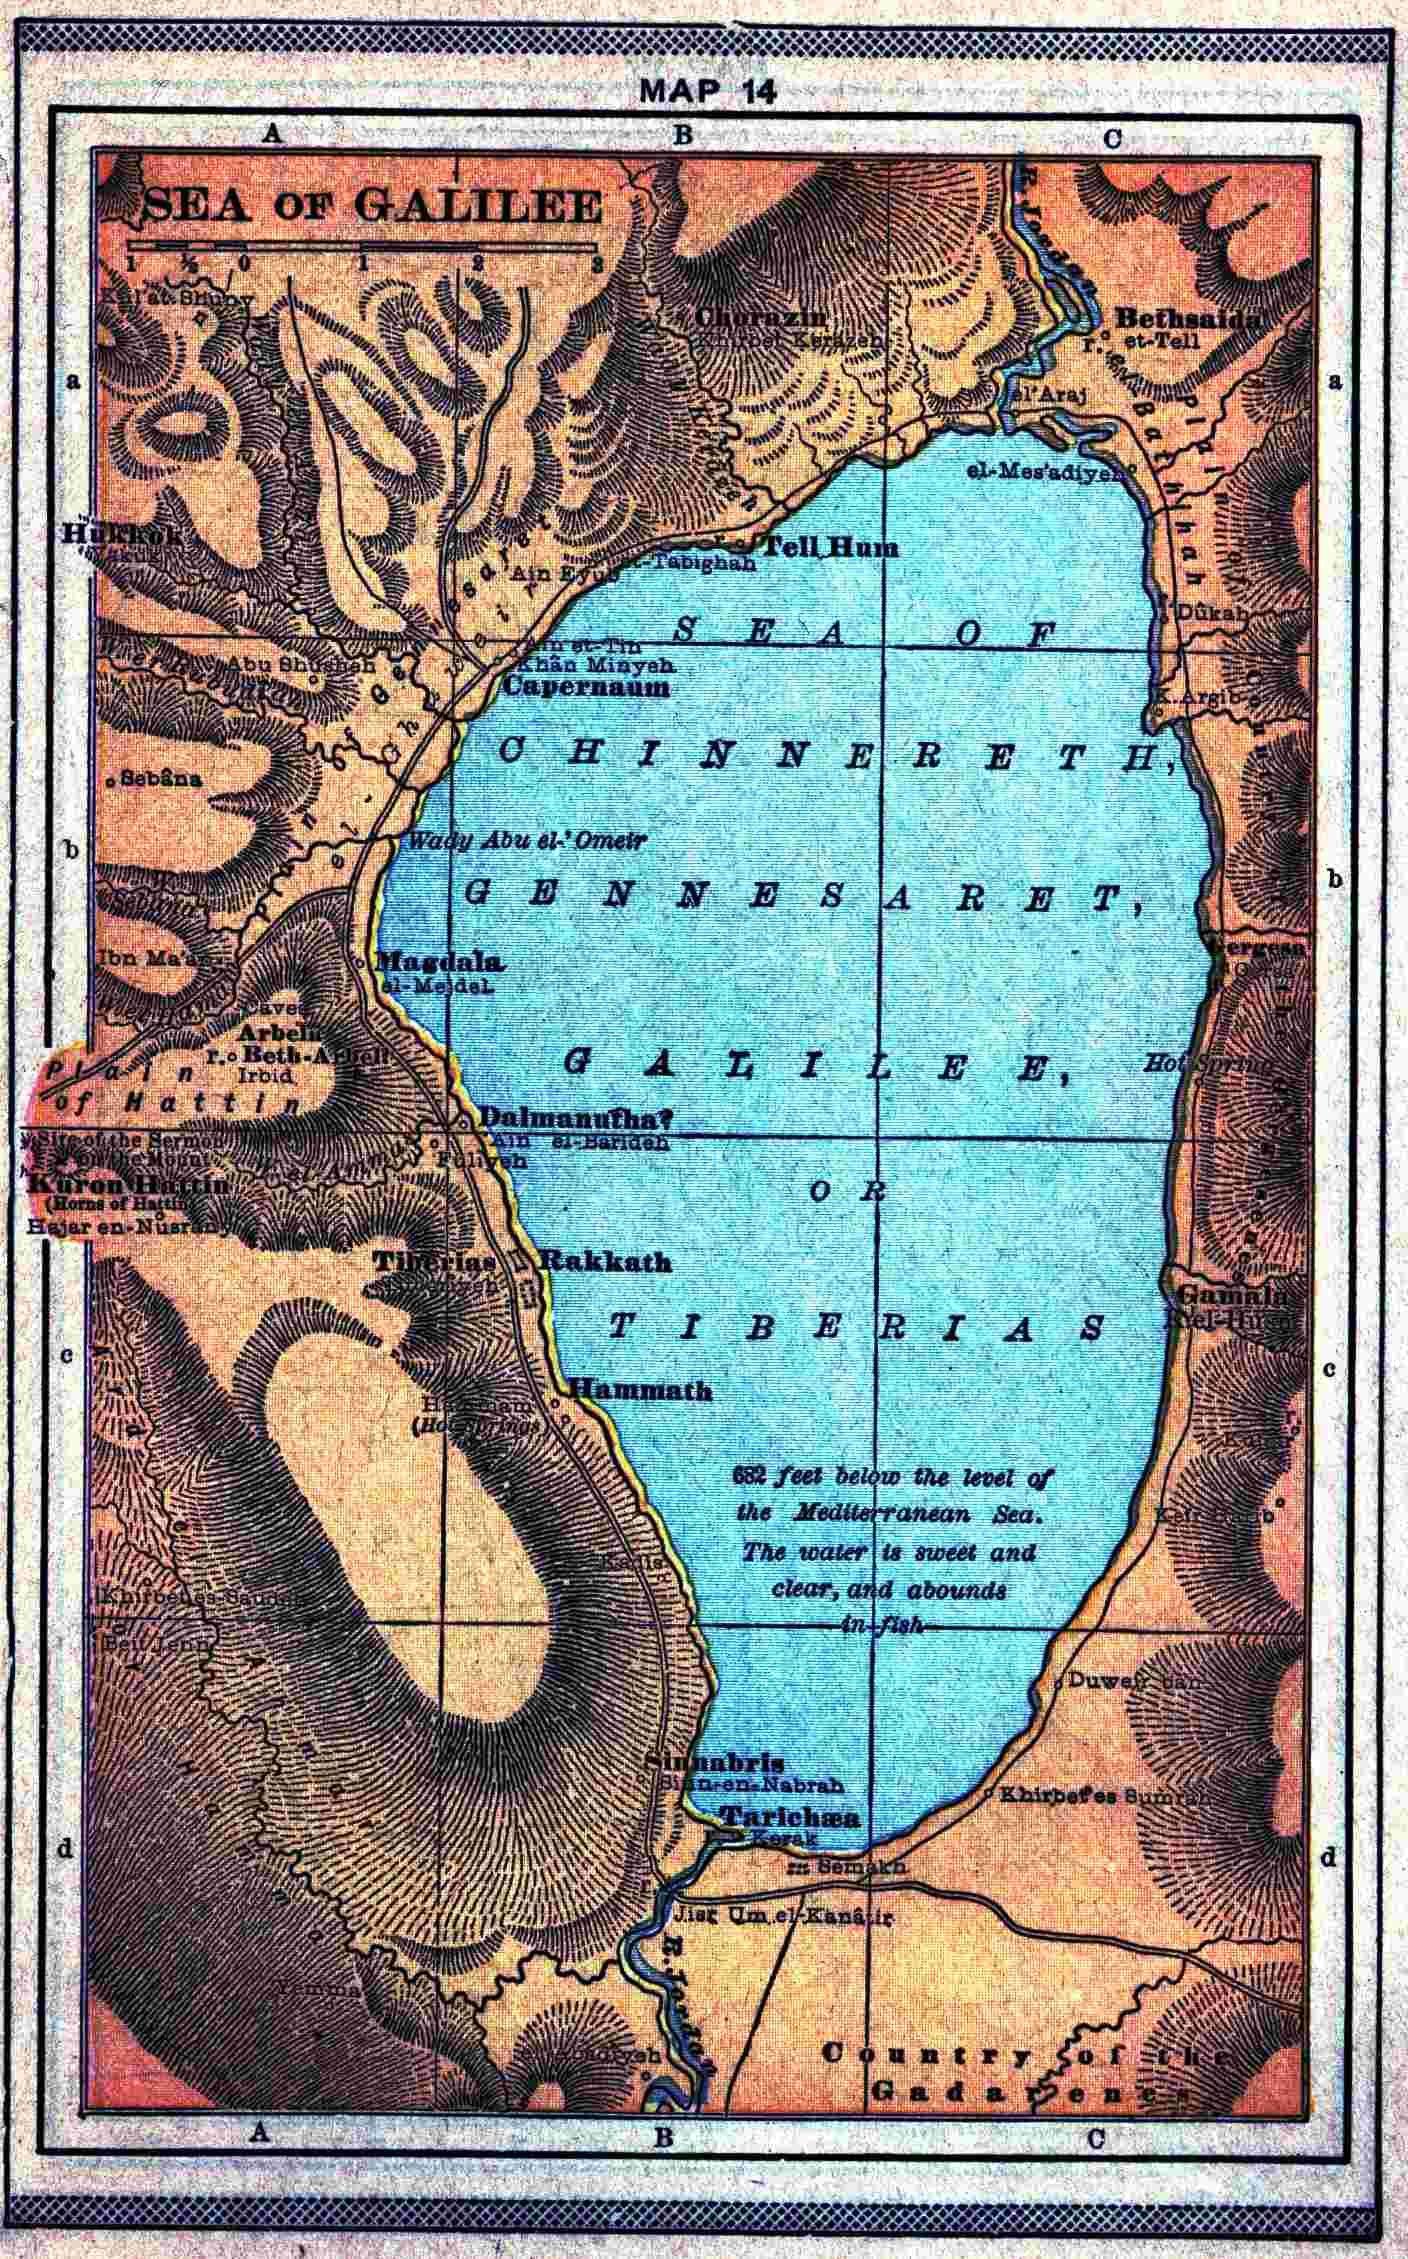 Sea of Galilee Map